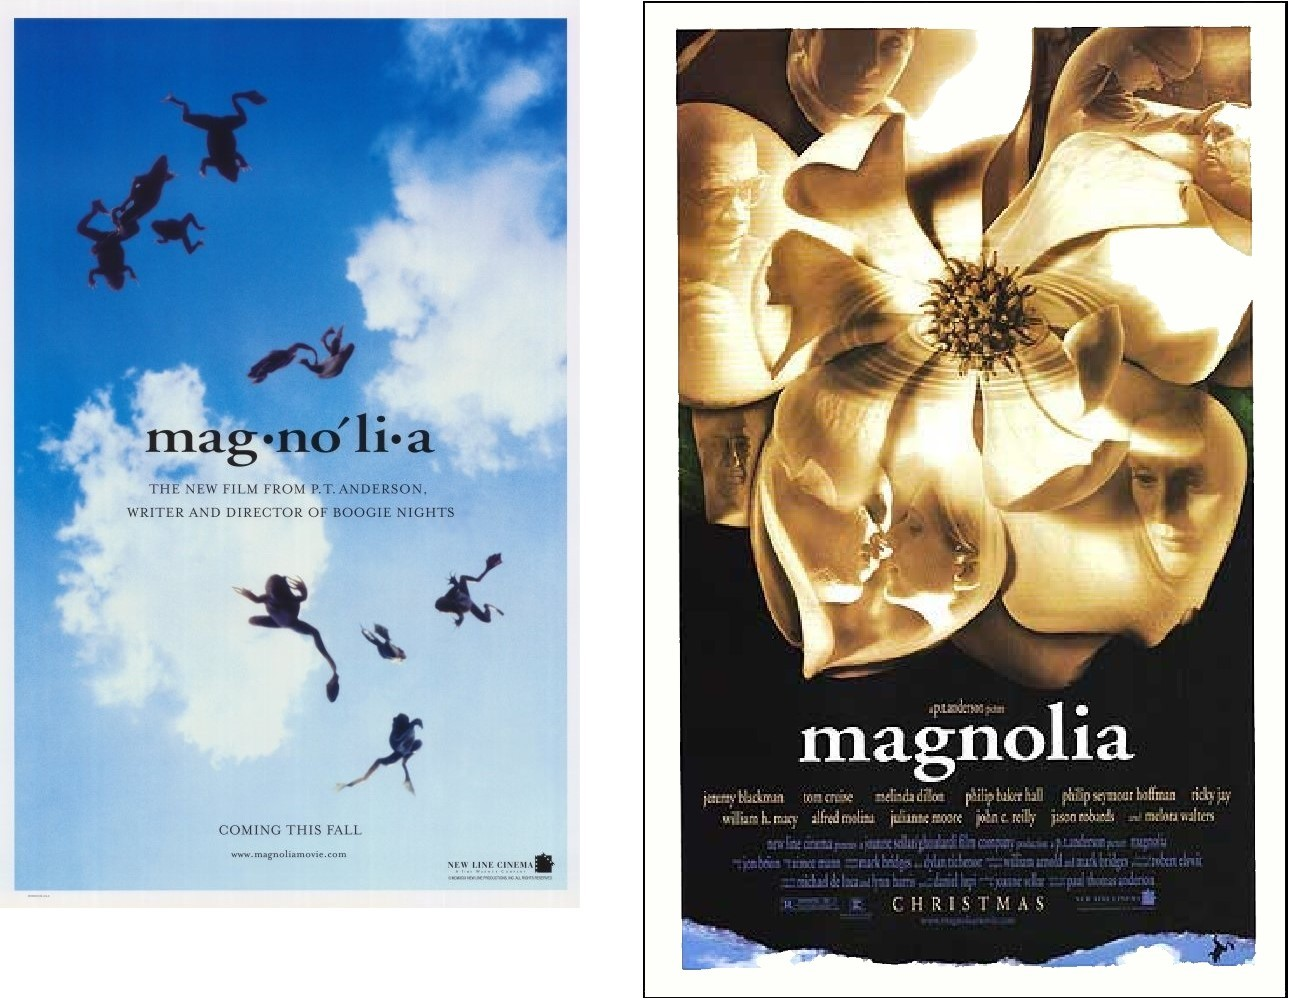 Magnolia posters